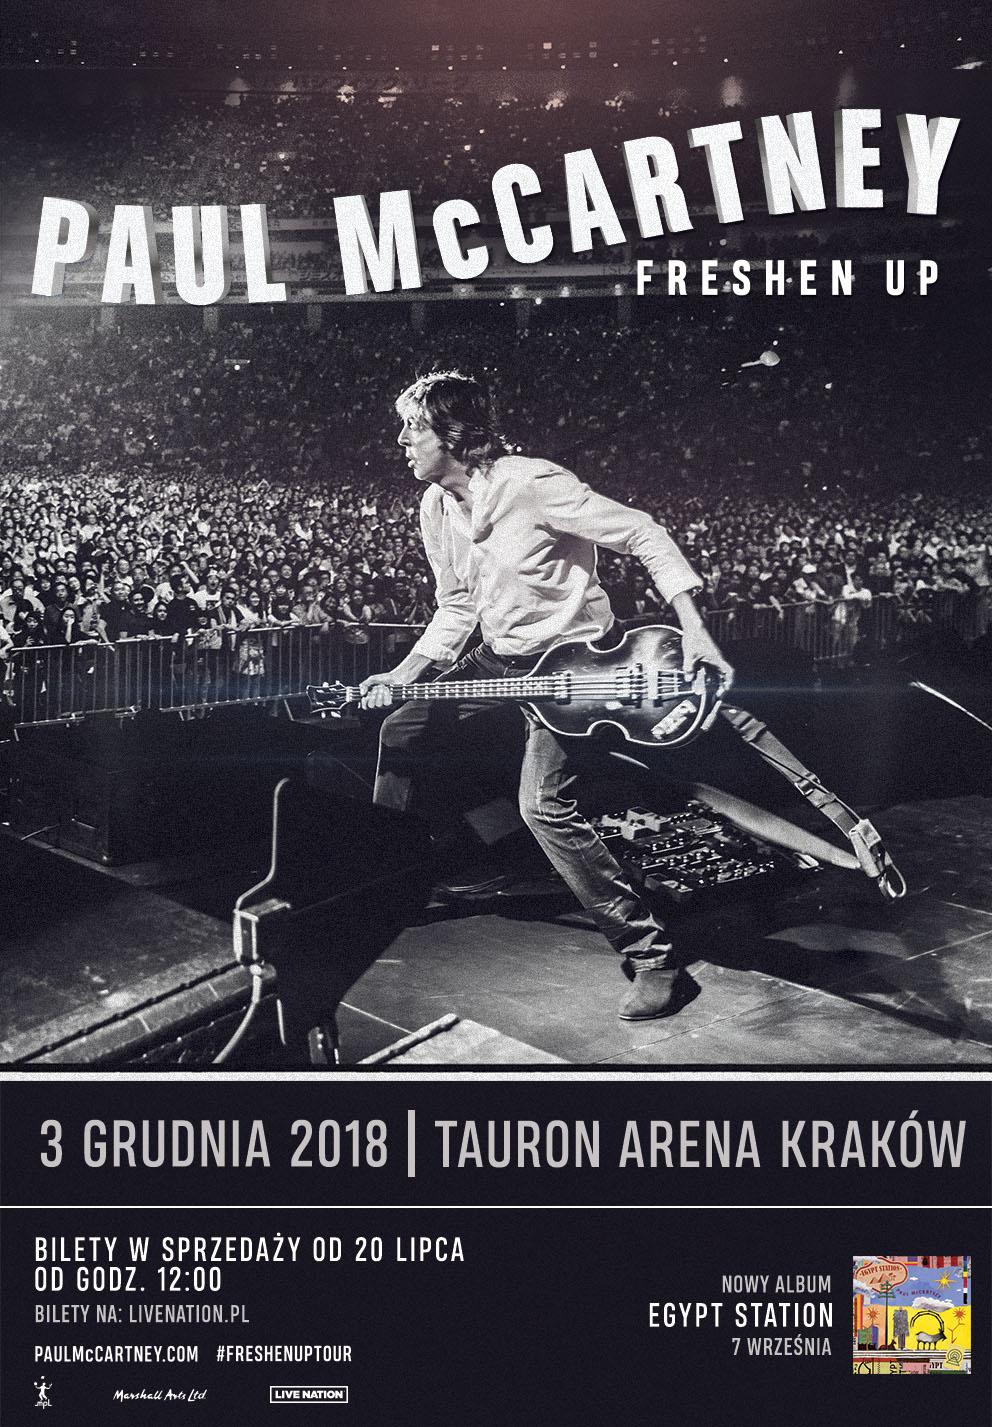 The Beatles Polska: Paul McCartney zagra w Krakowie